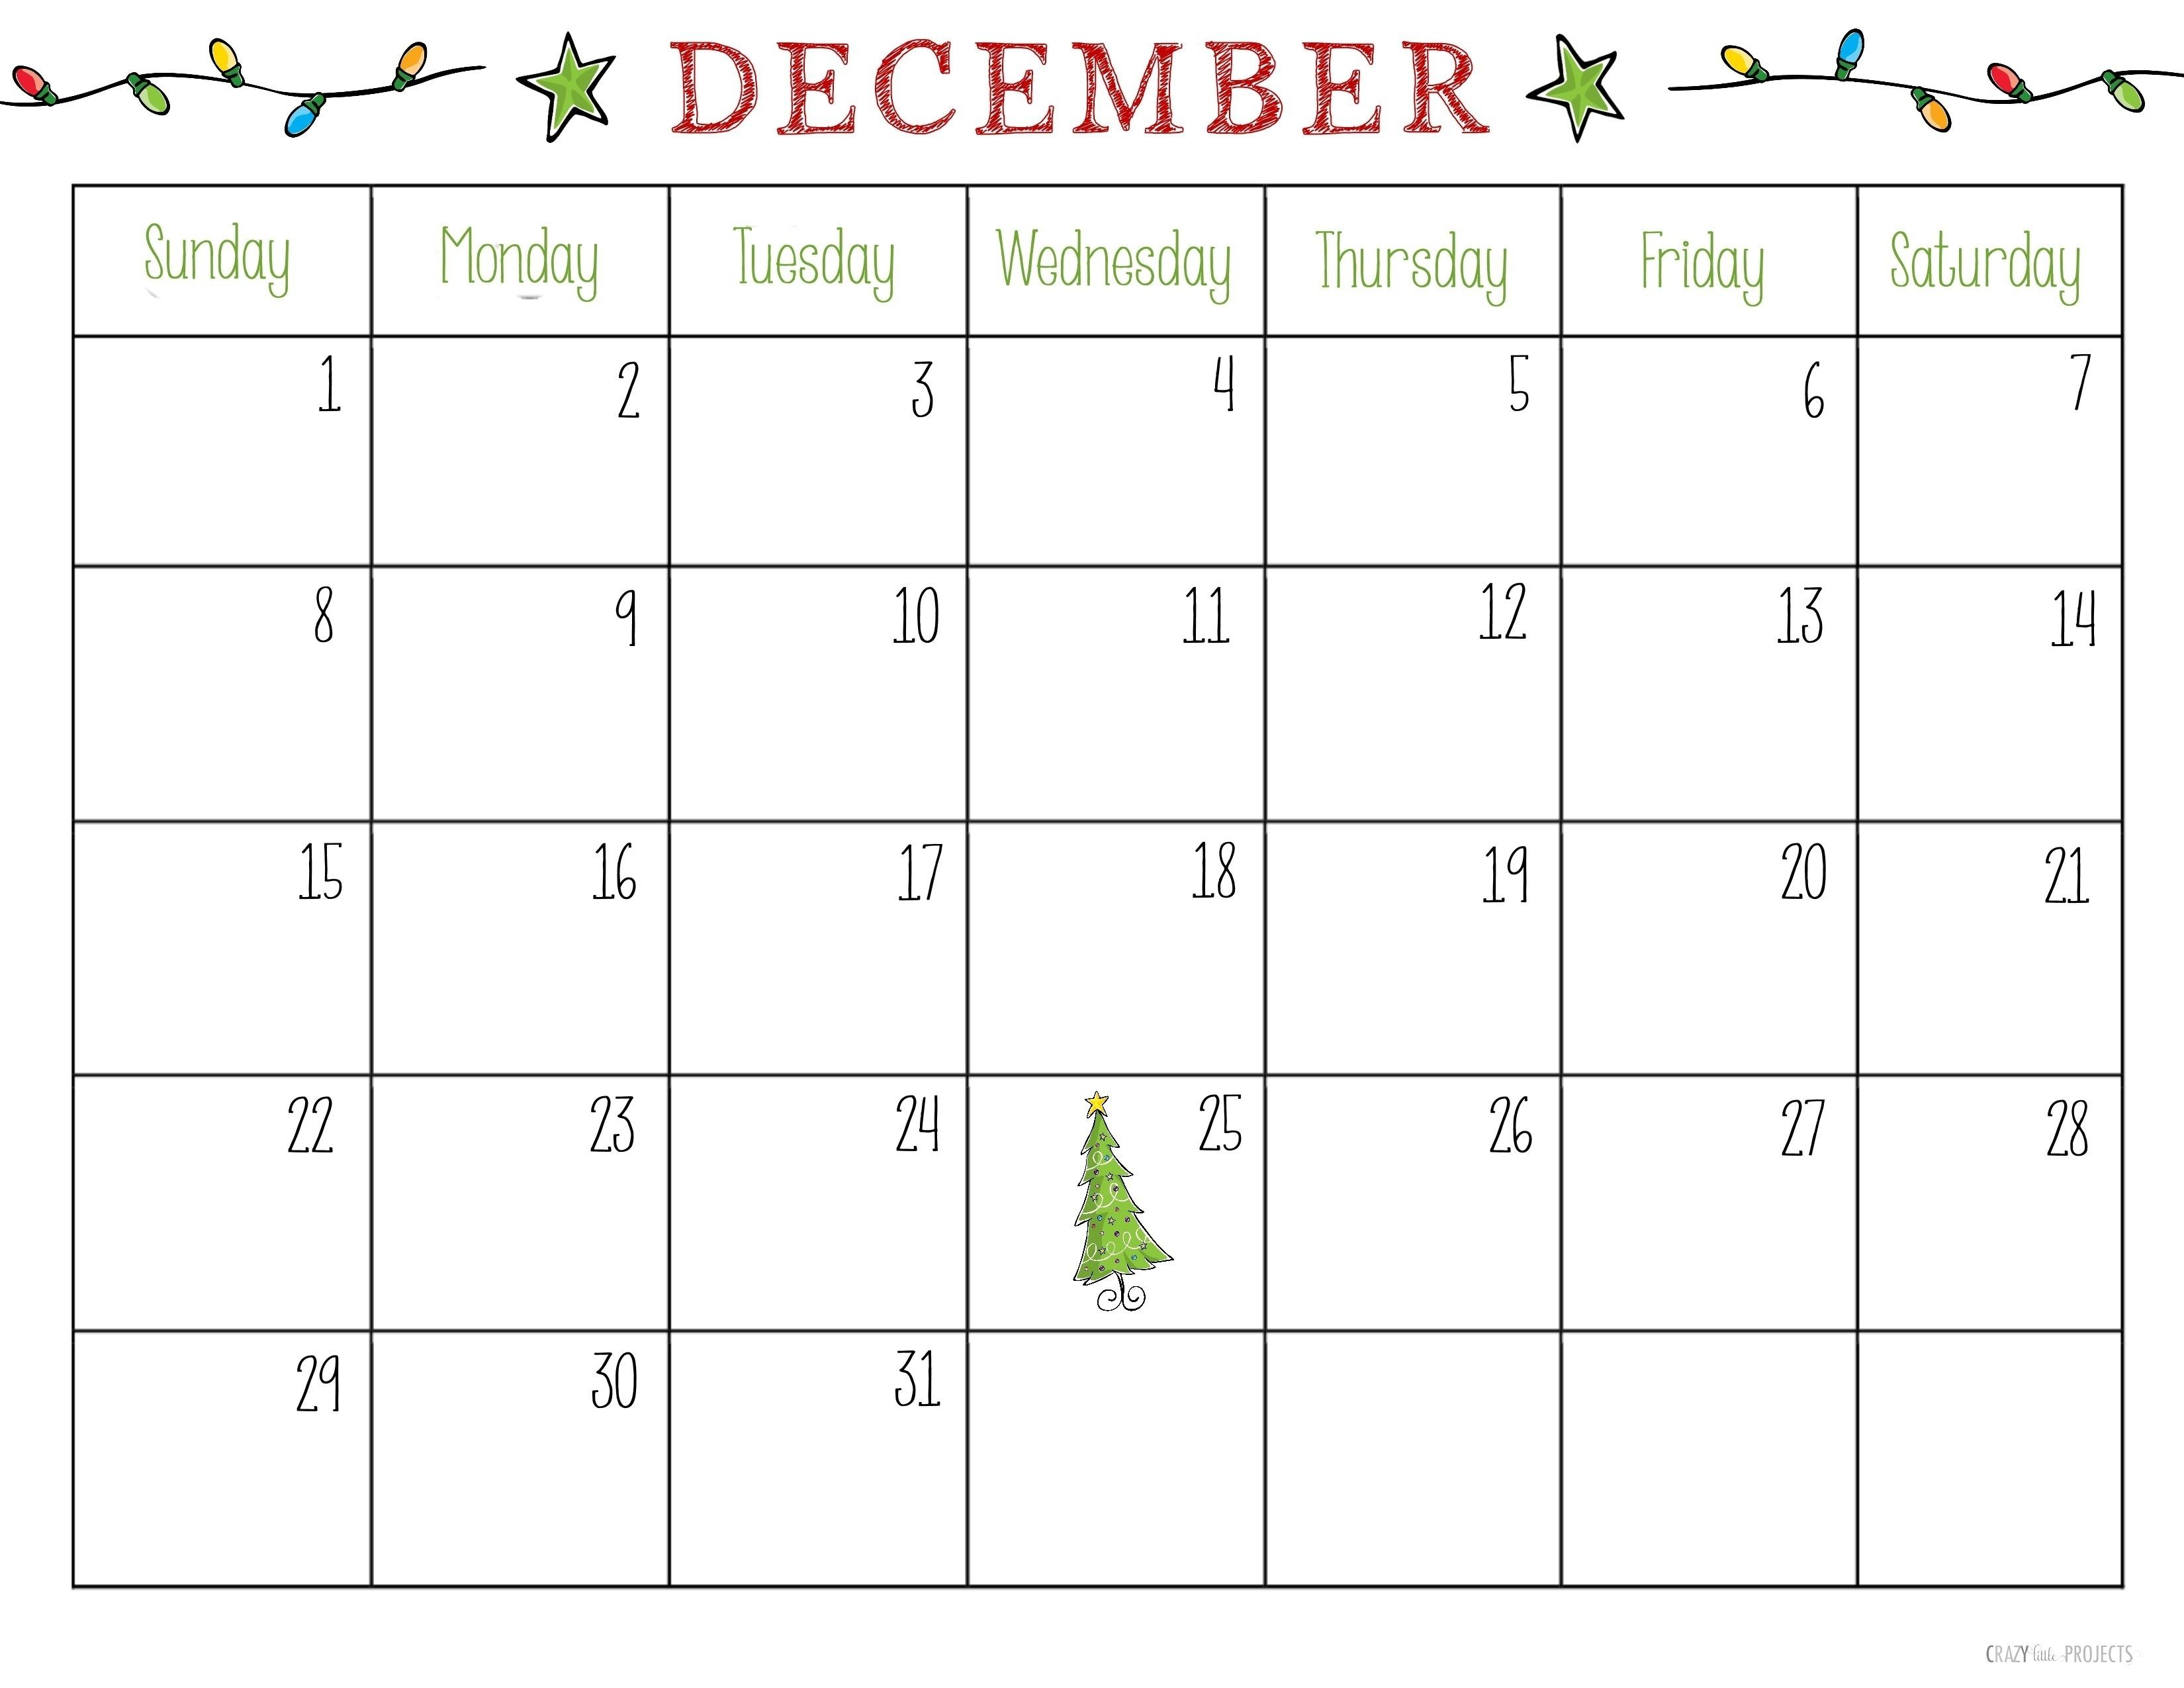 December 2018 Calendar Printable Pretty December 2019 Calendar